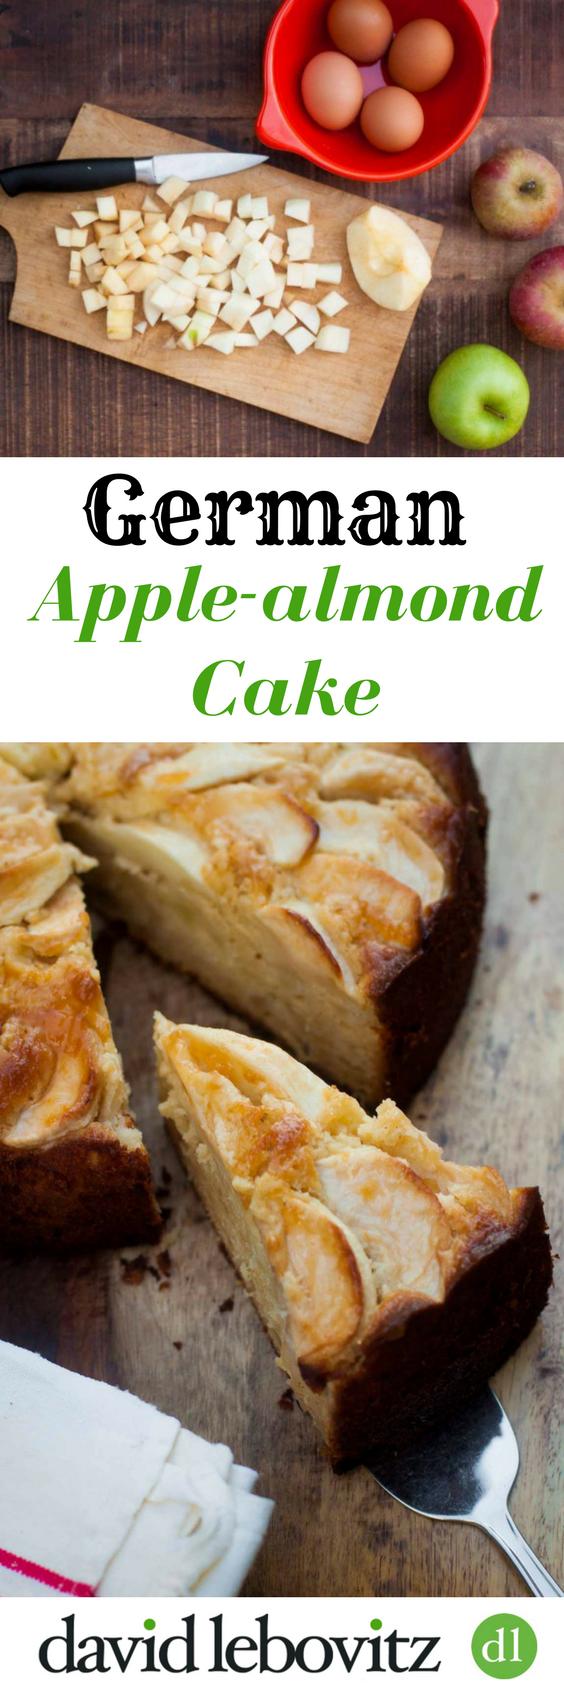 German Apple-Almond Cake